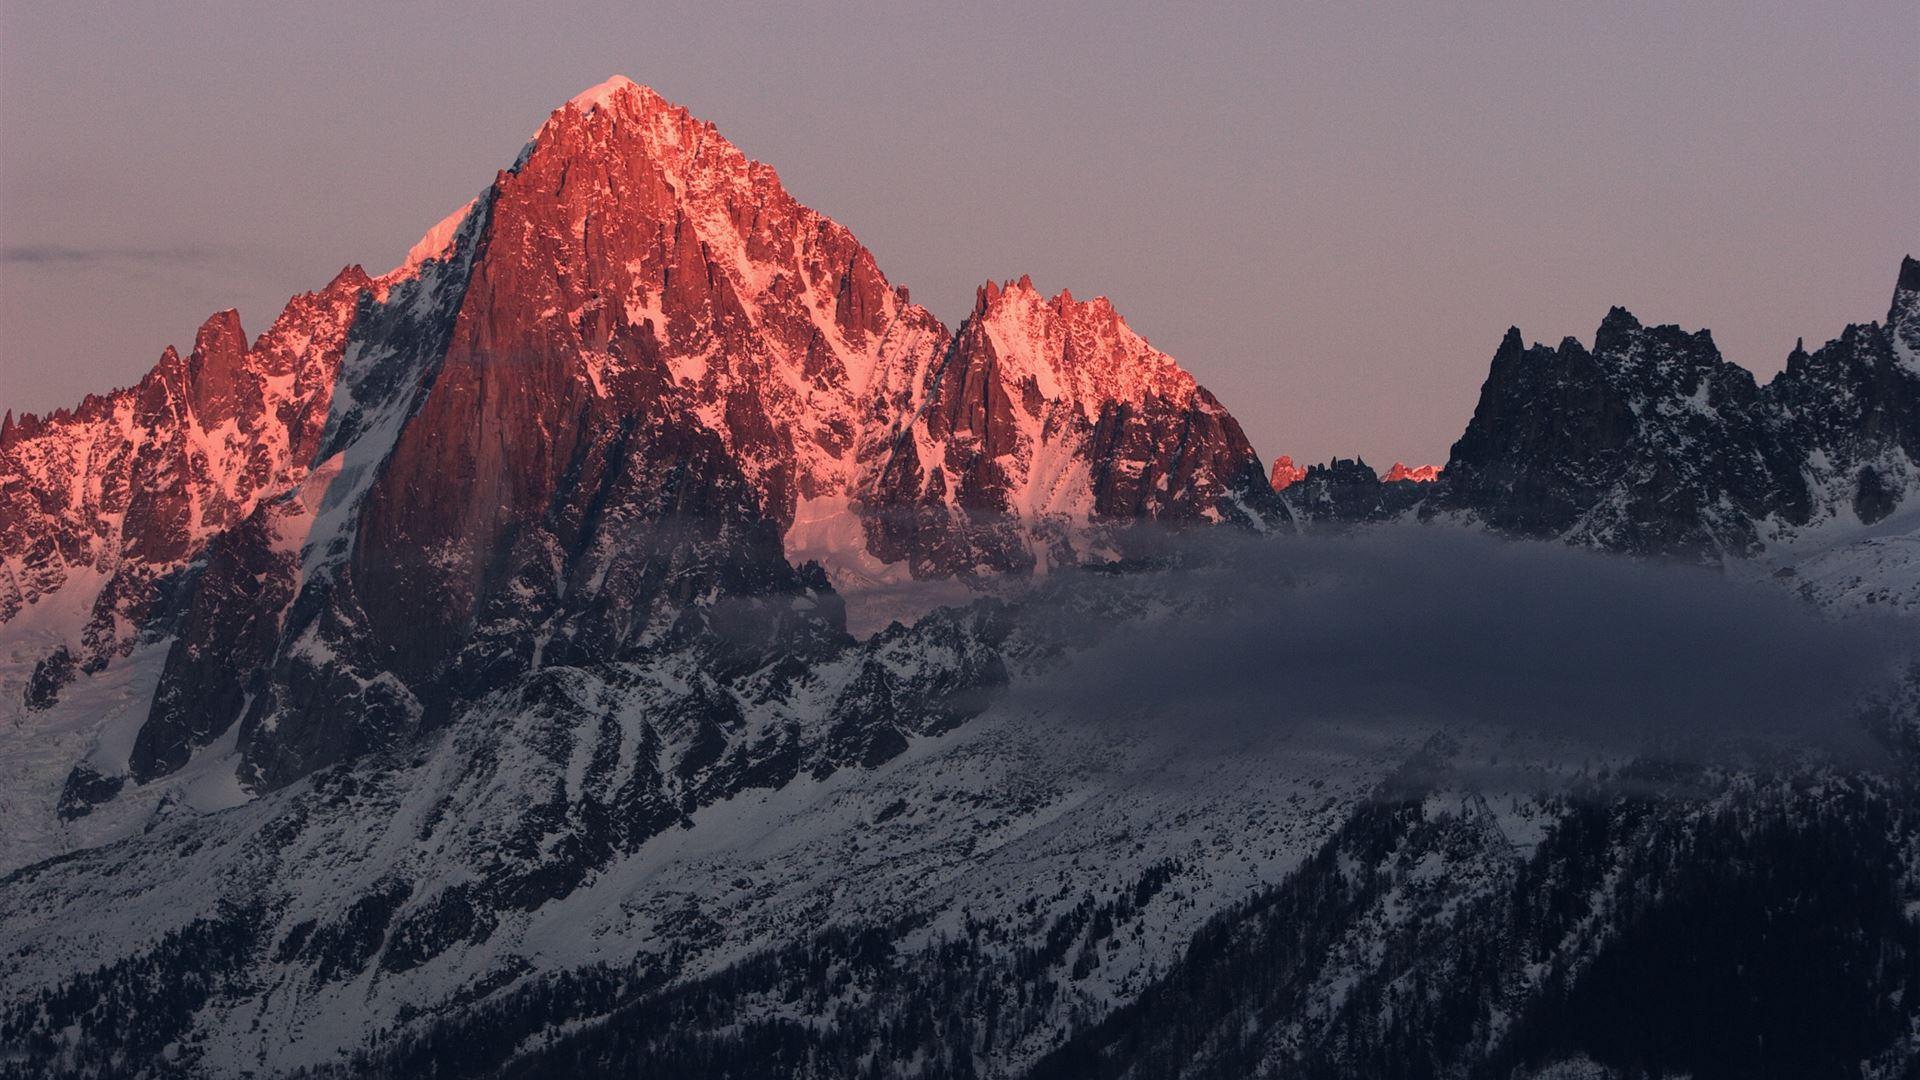 Snow mountain Mac Wallpaper Download | Free Mac Wallpapers ...